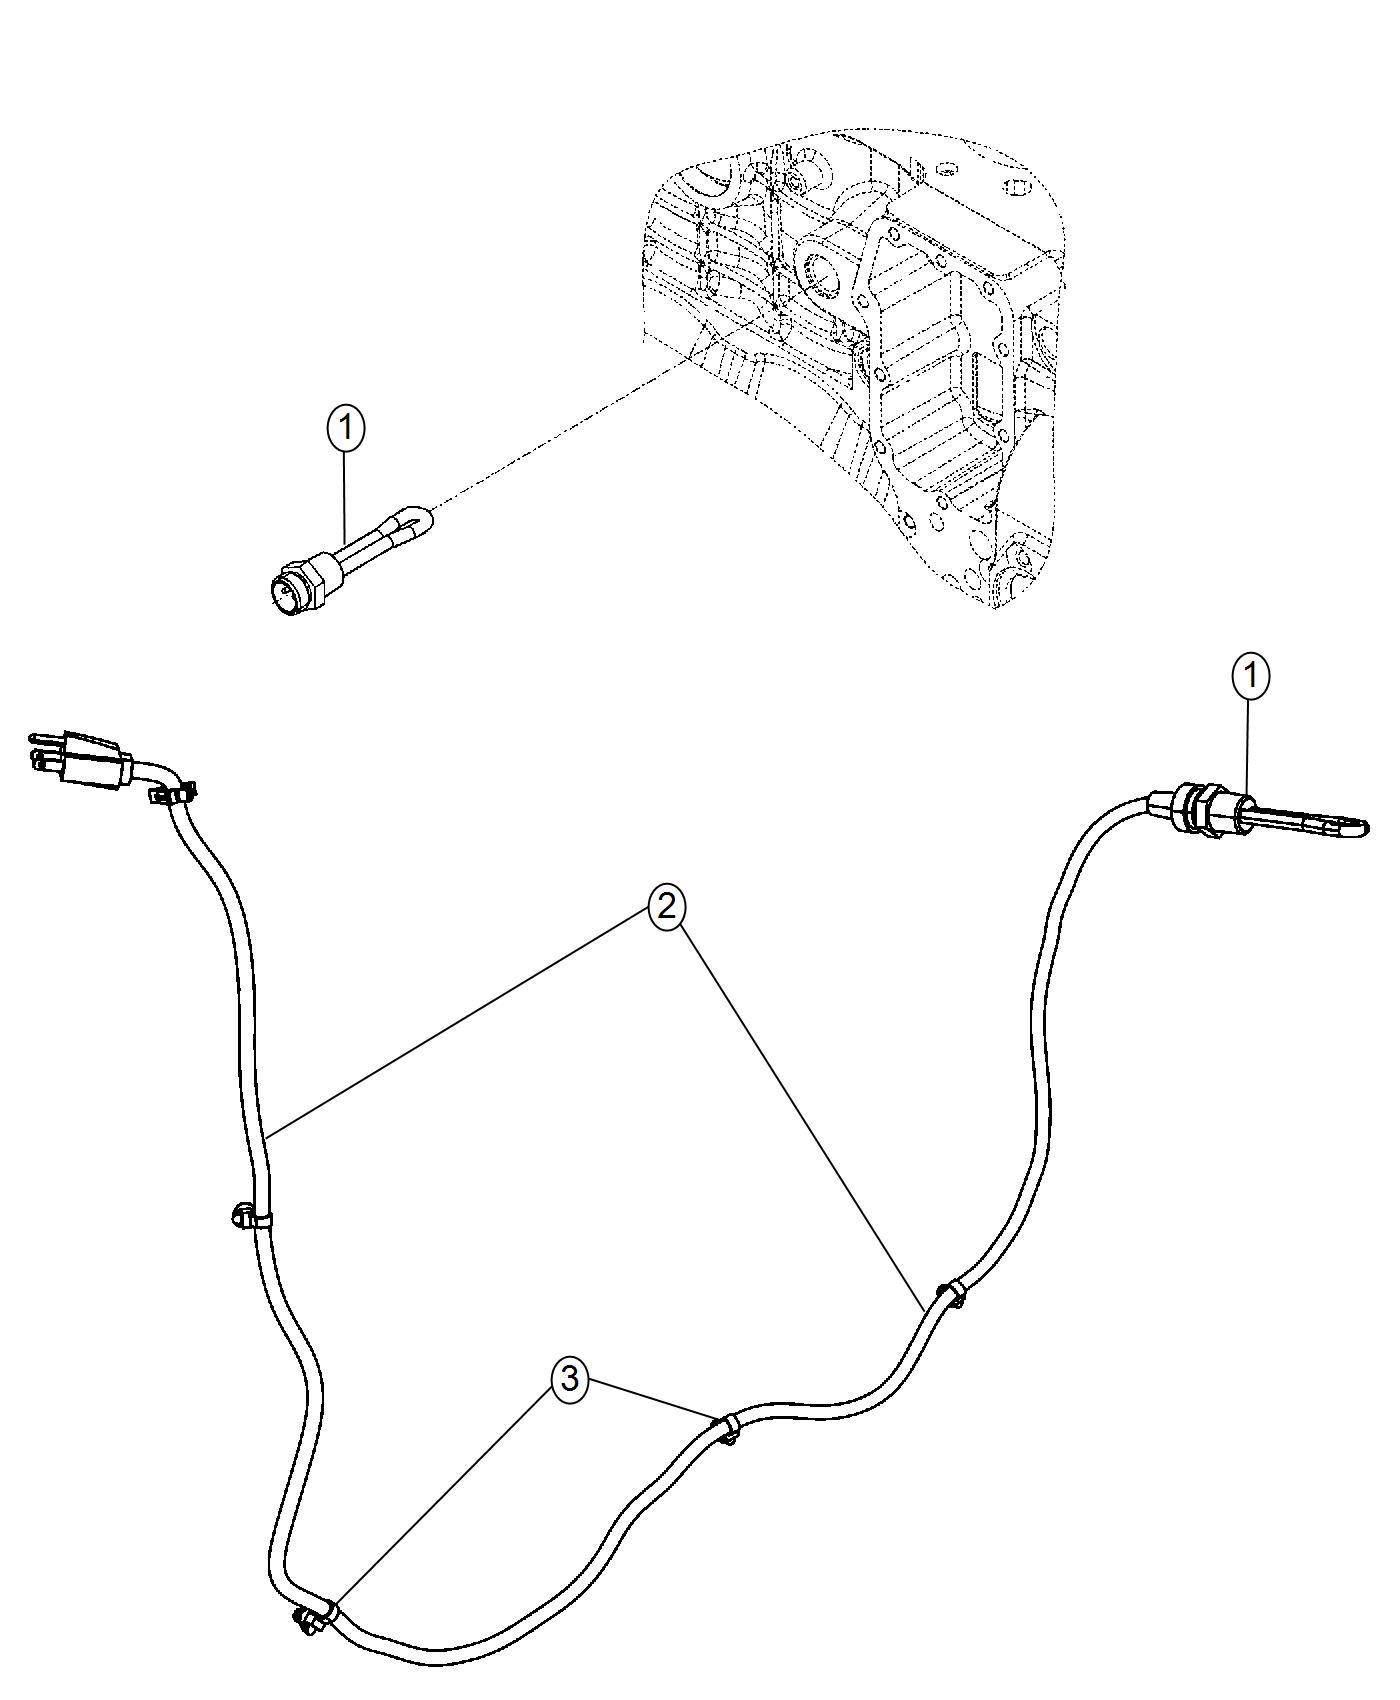 Ram 5500 Cord. Engine block heater. [engine block heater